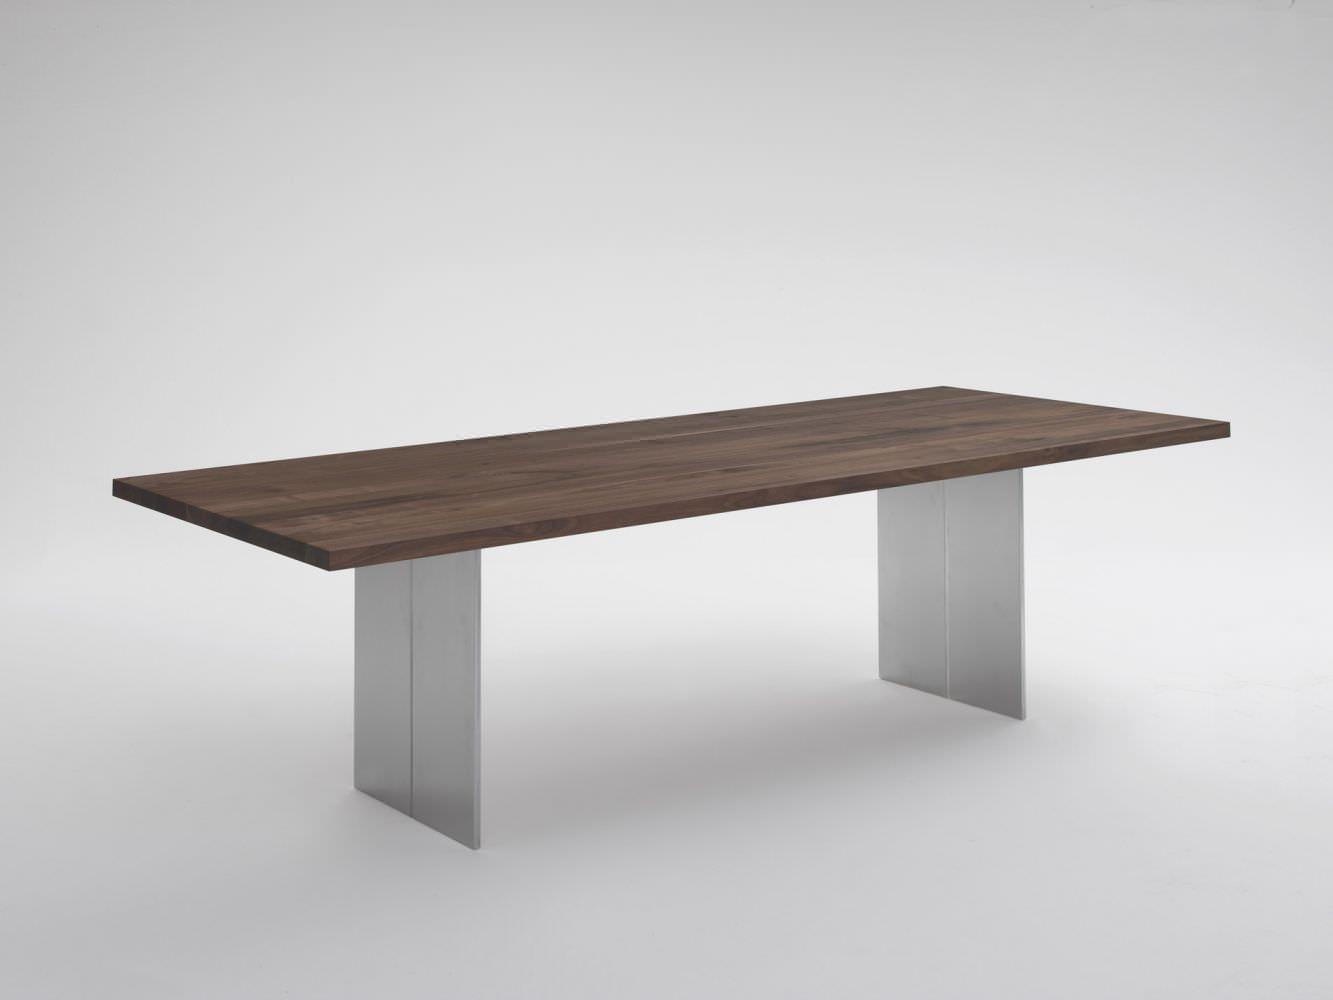 ... Moderner Tisch / Massivholz / Aus Aluminium / Rechteckig ORLANDO Riva  Industria Mobili